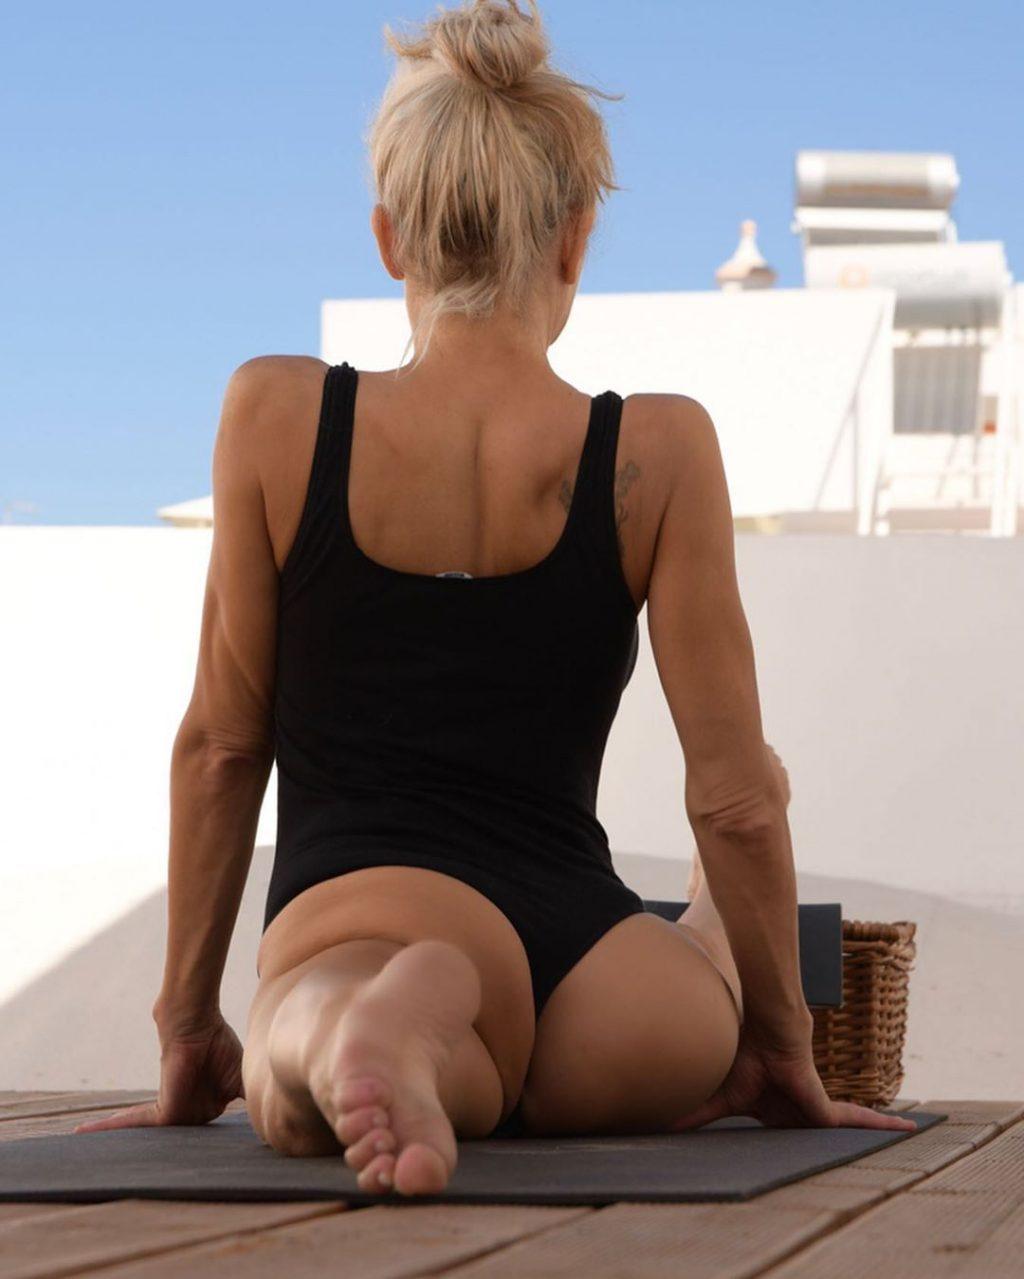 Yoga Flocke Nude & Sexy 080